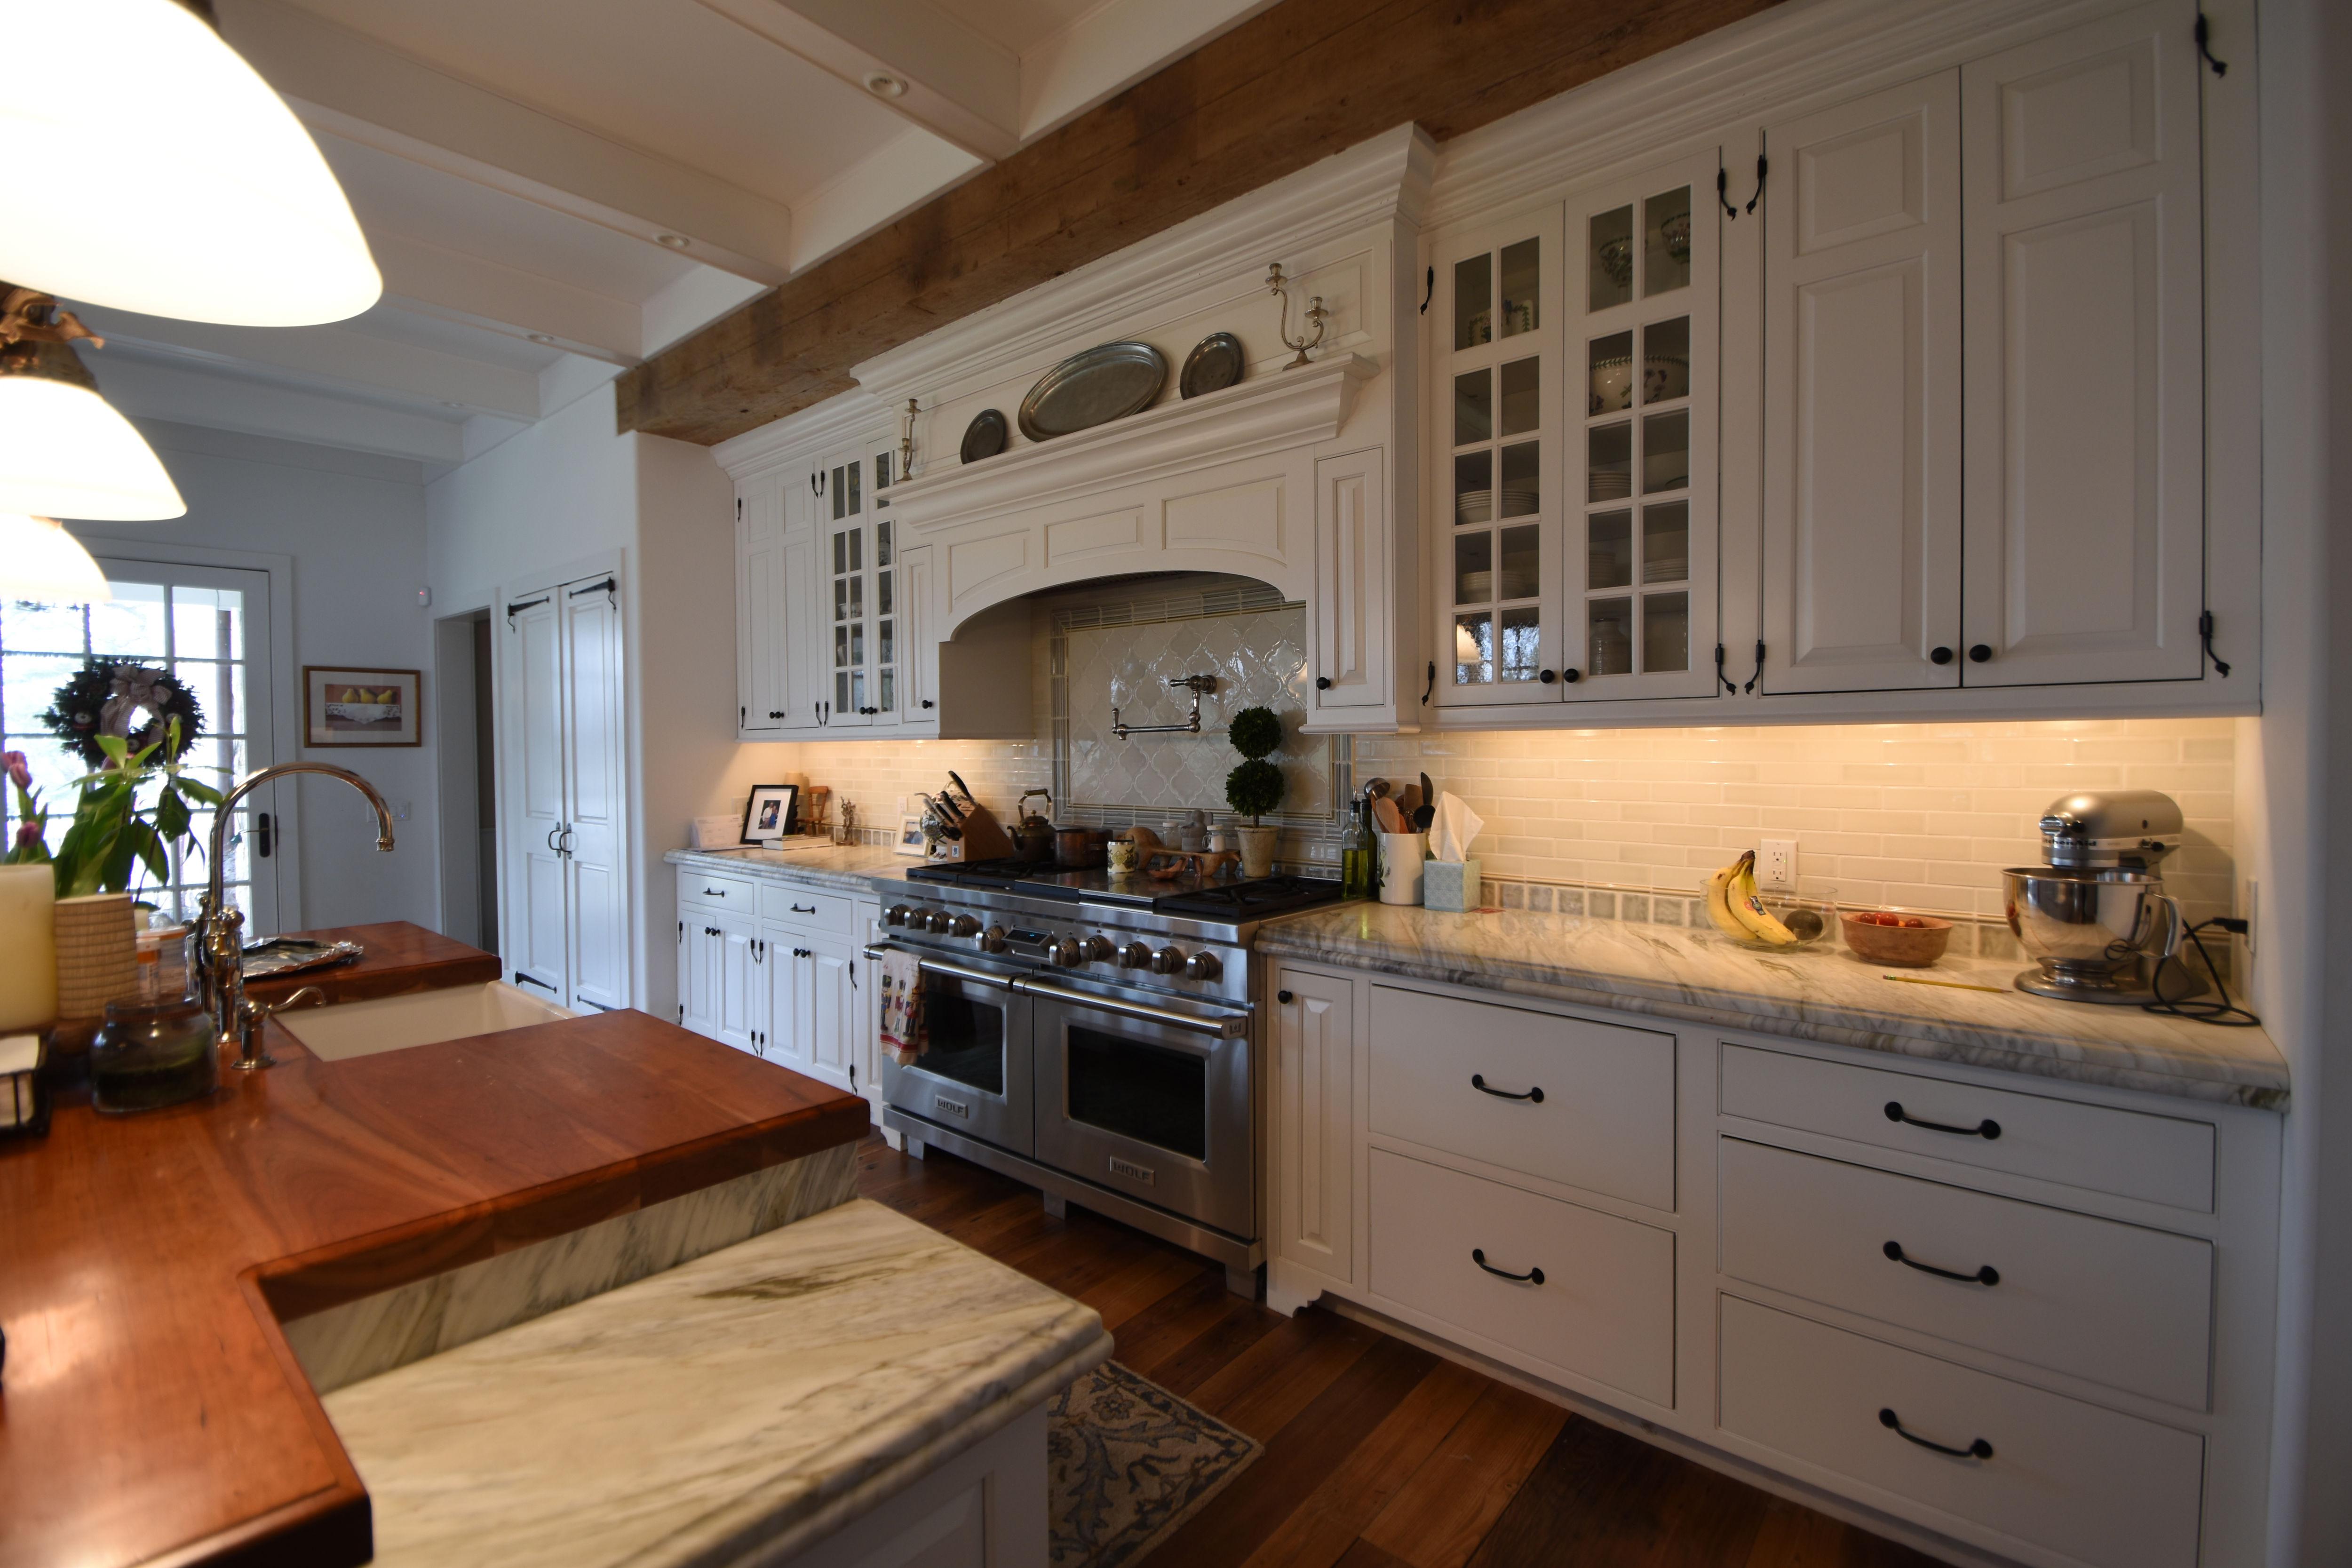 Kitchen music & lighting control